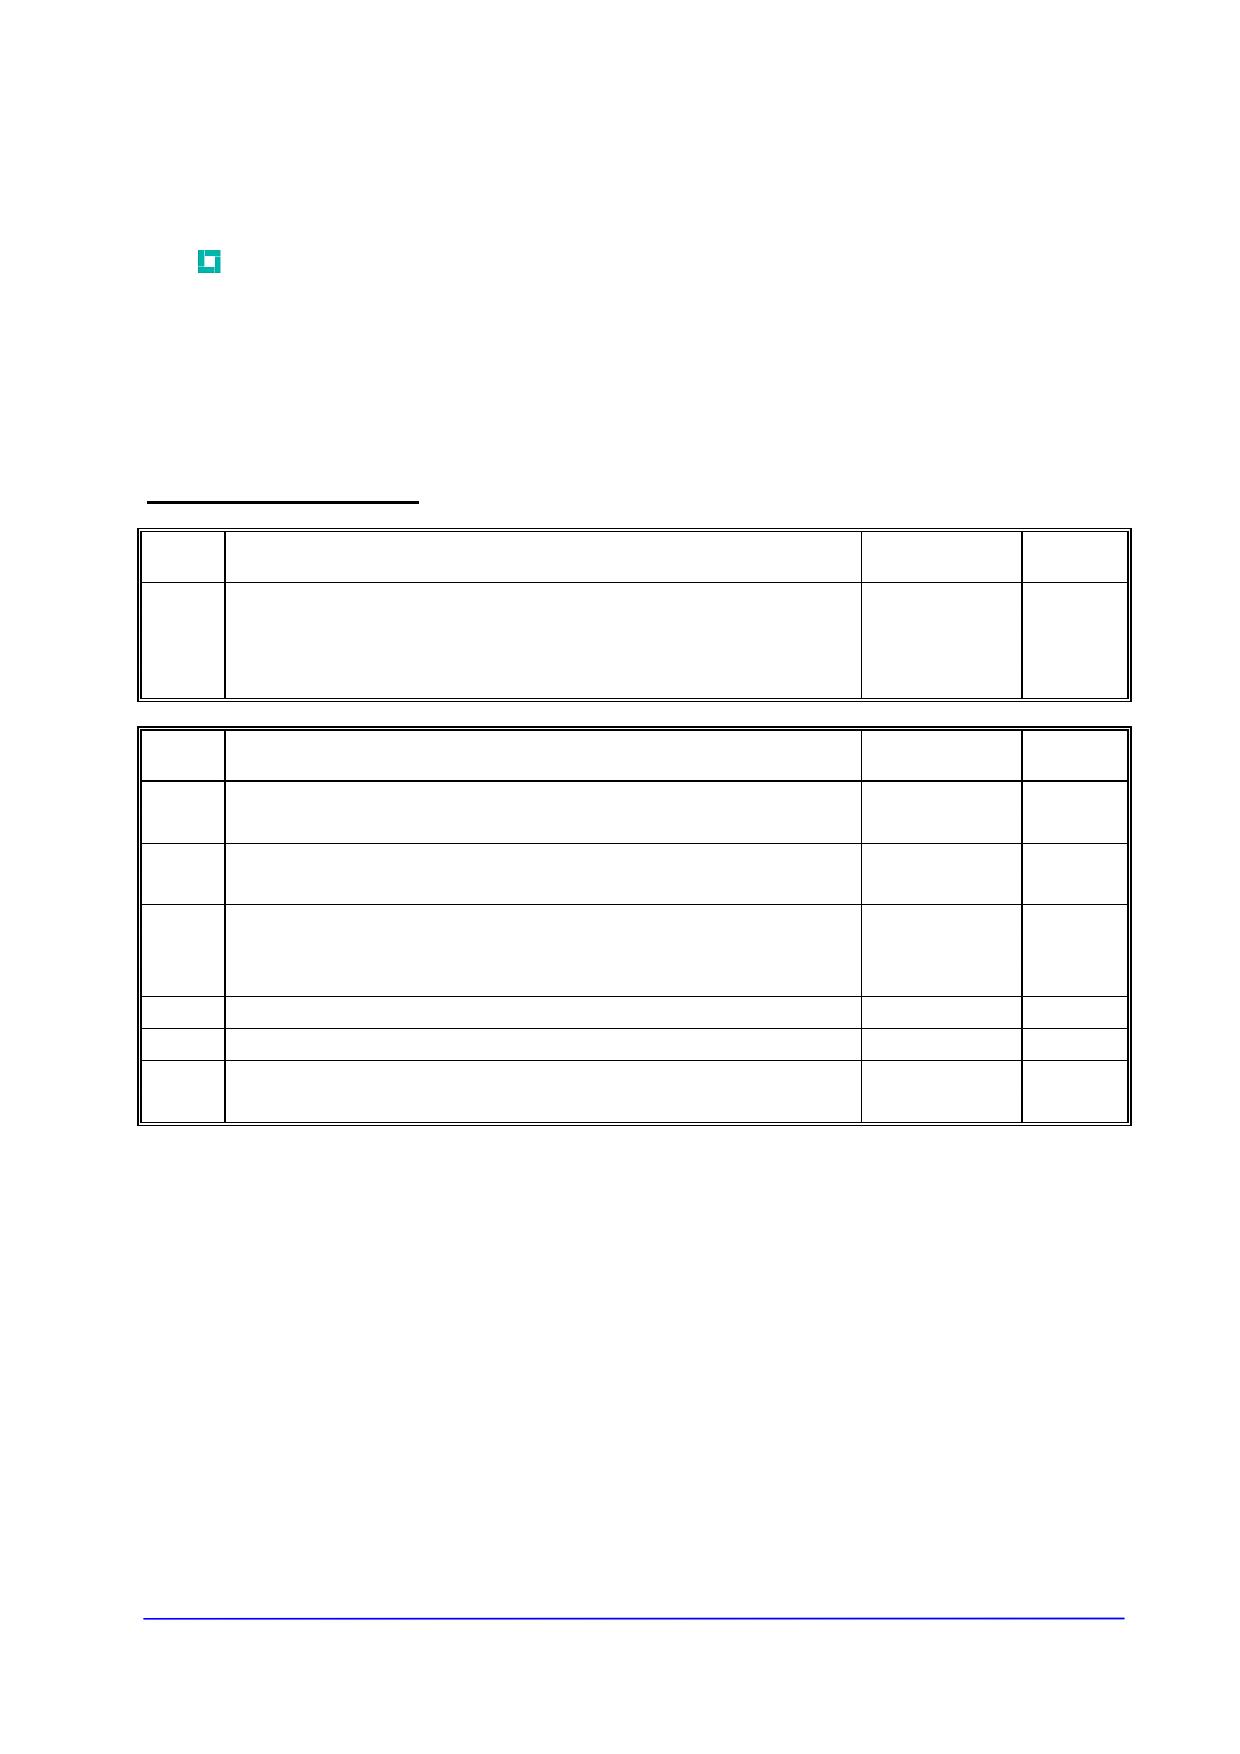 G1000NL450 دیتاشیت PDF